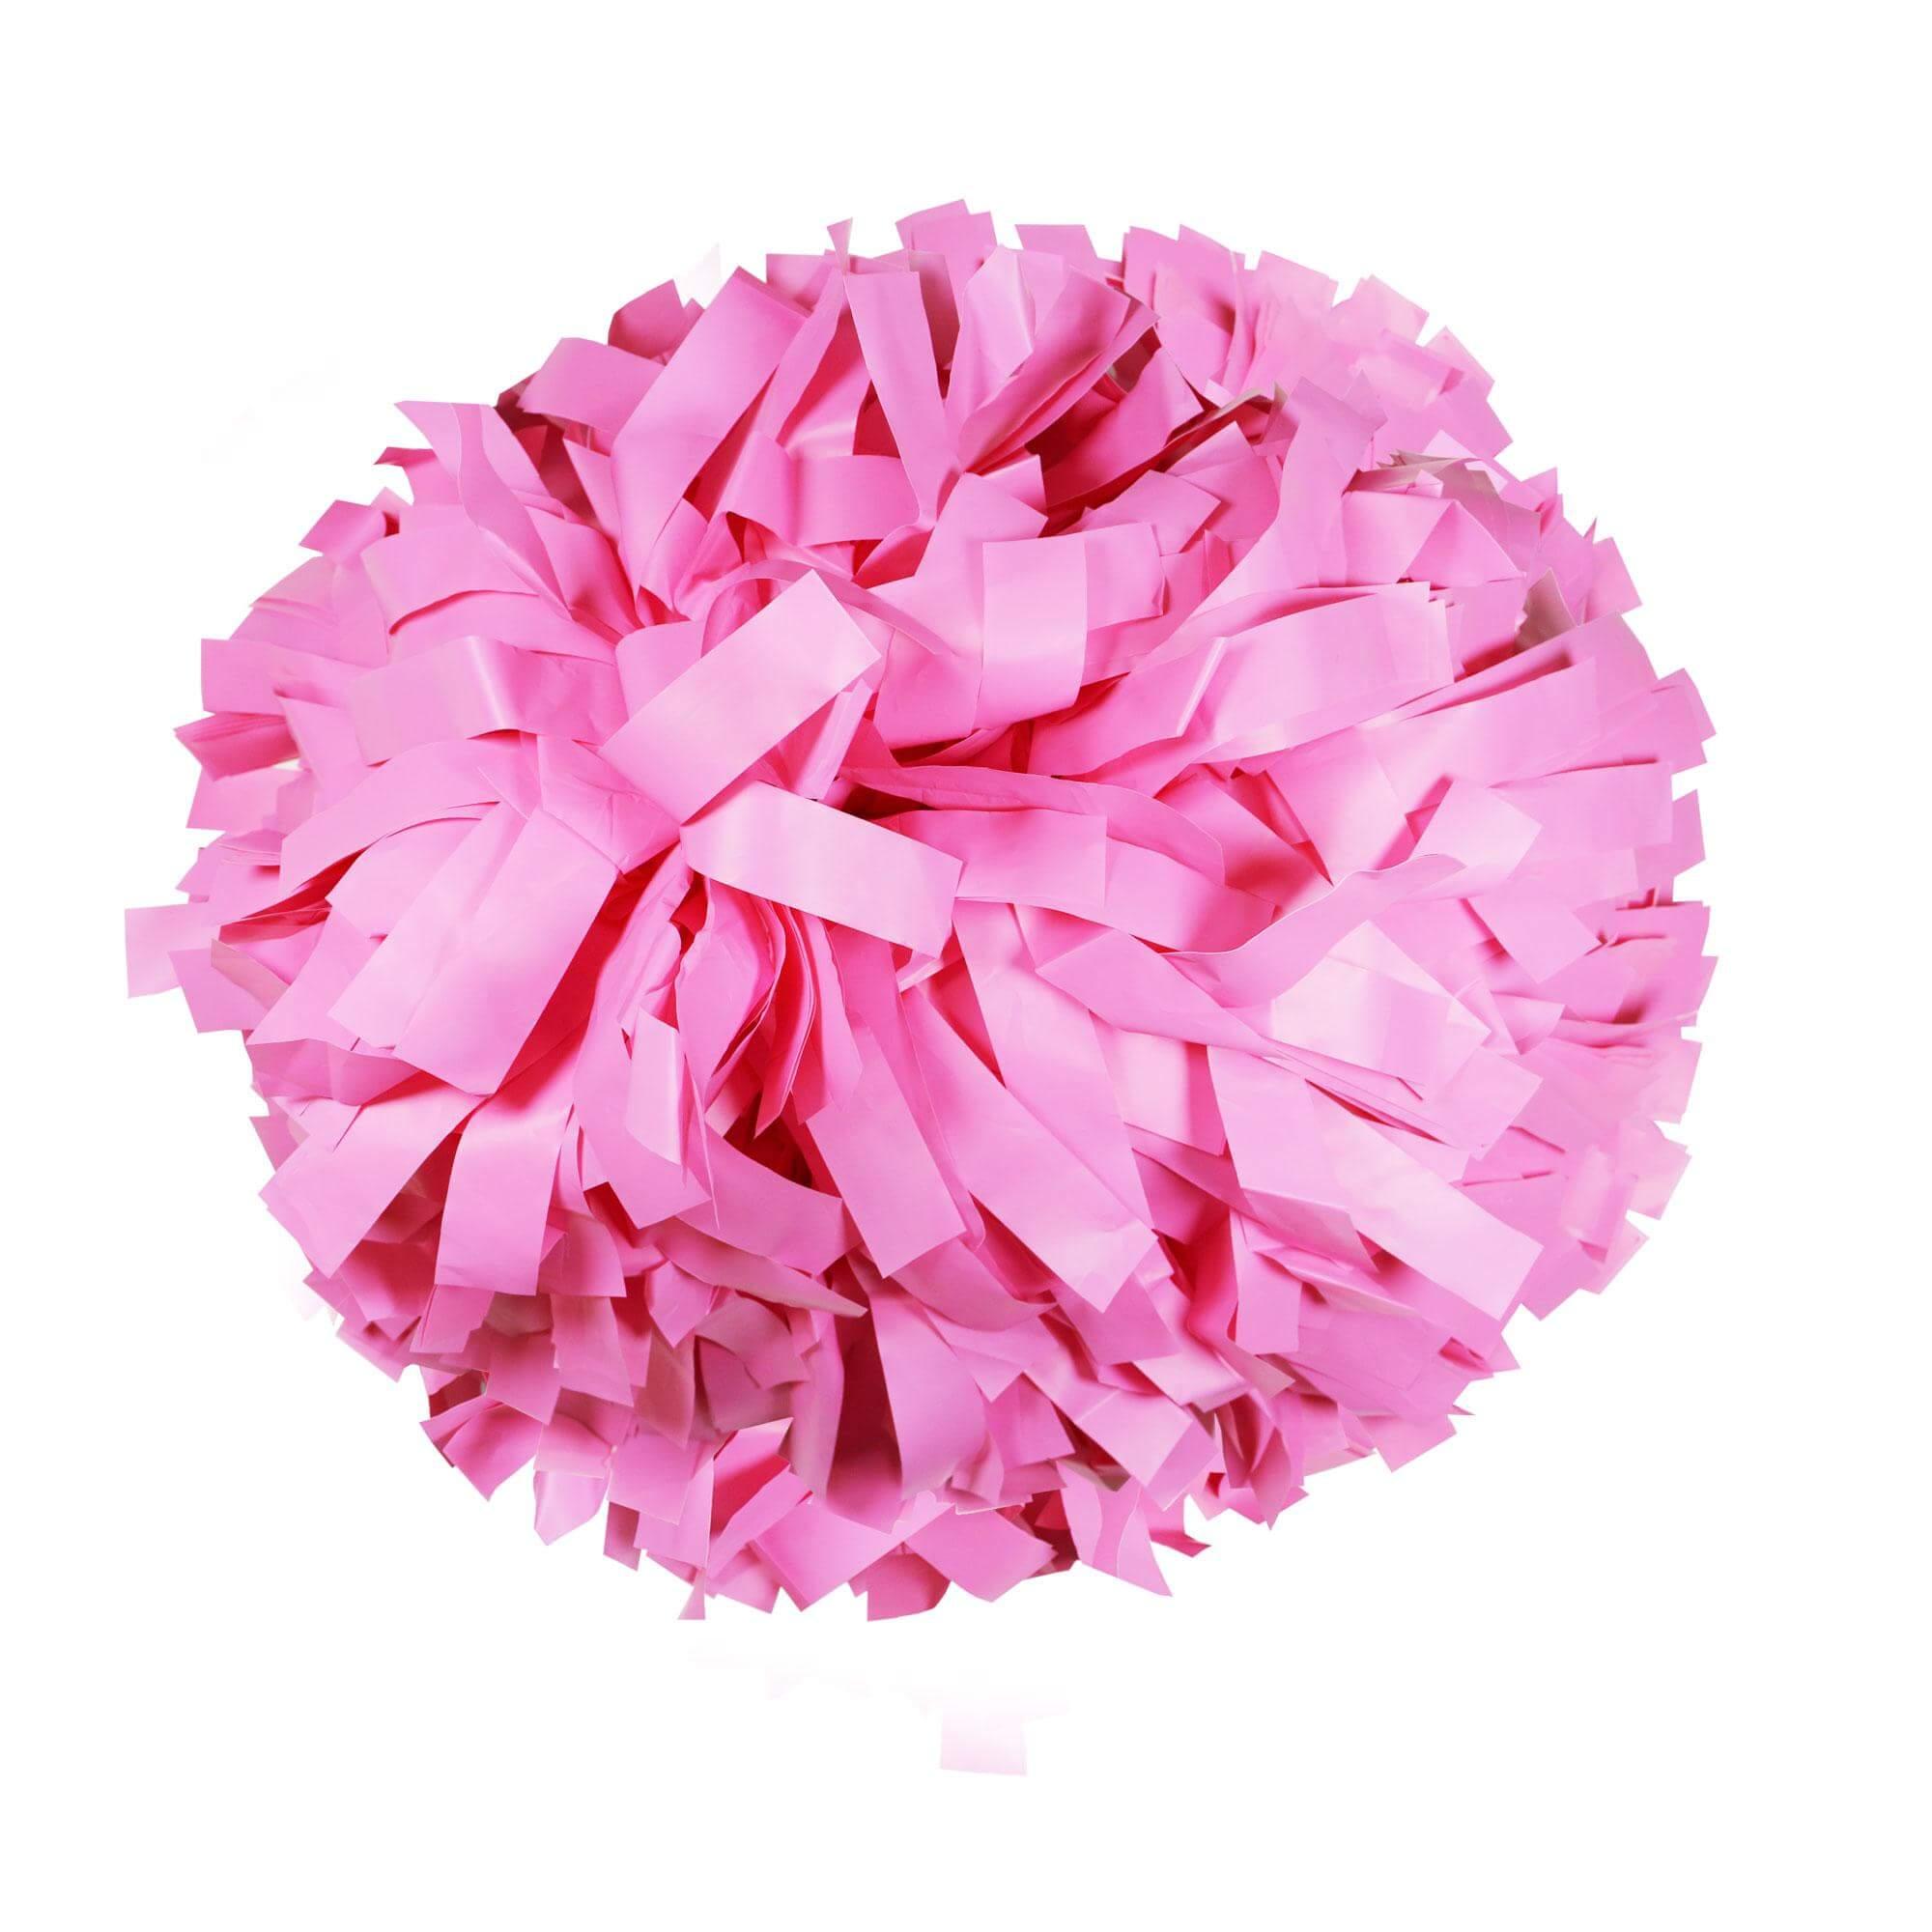 Danzcue Neon Pink Plastic Poms